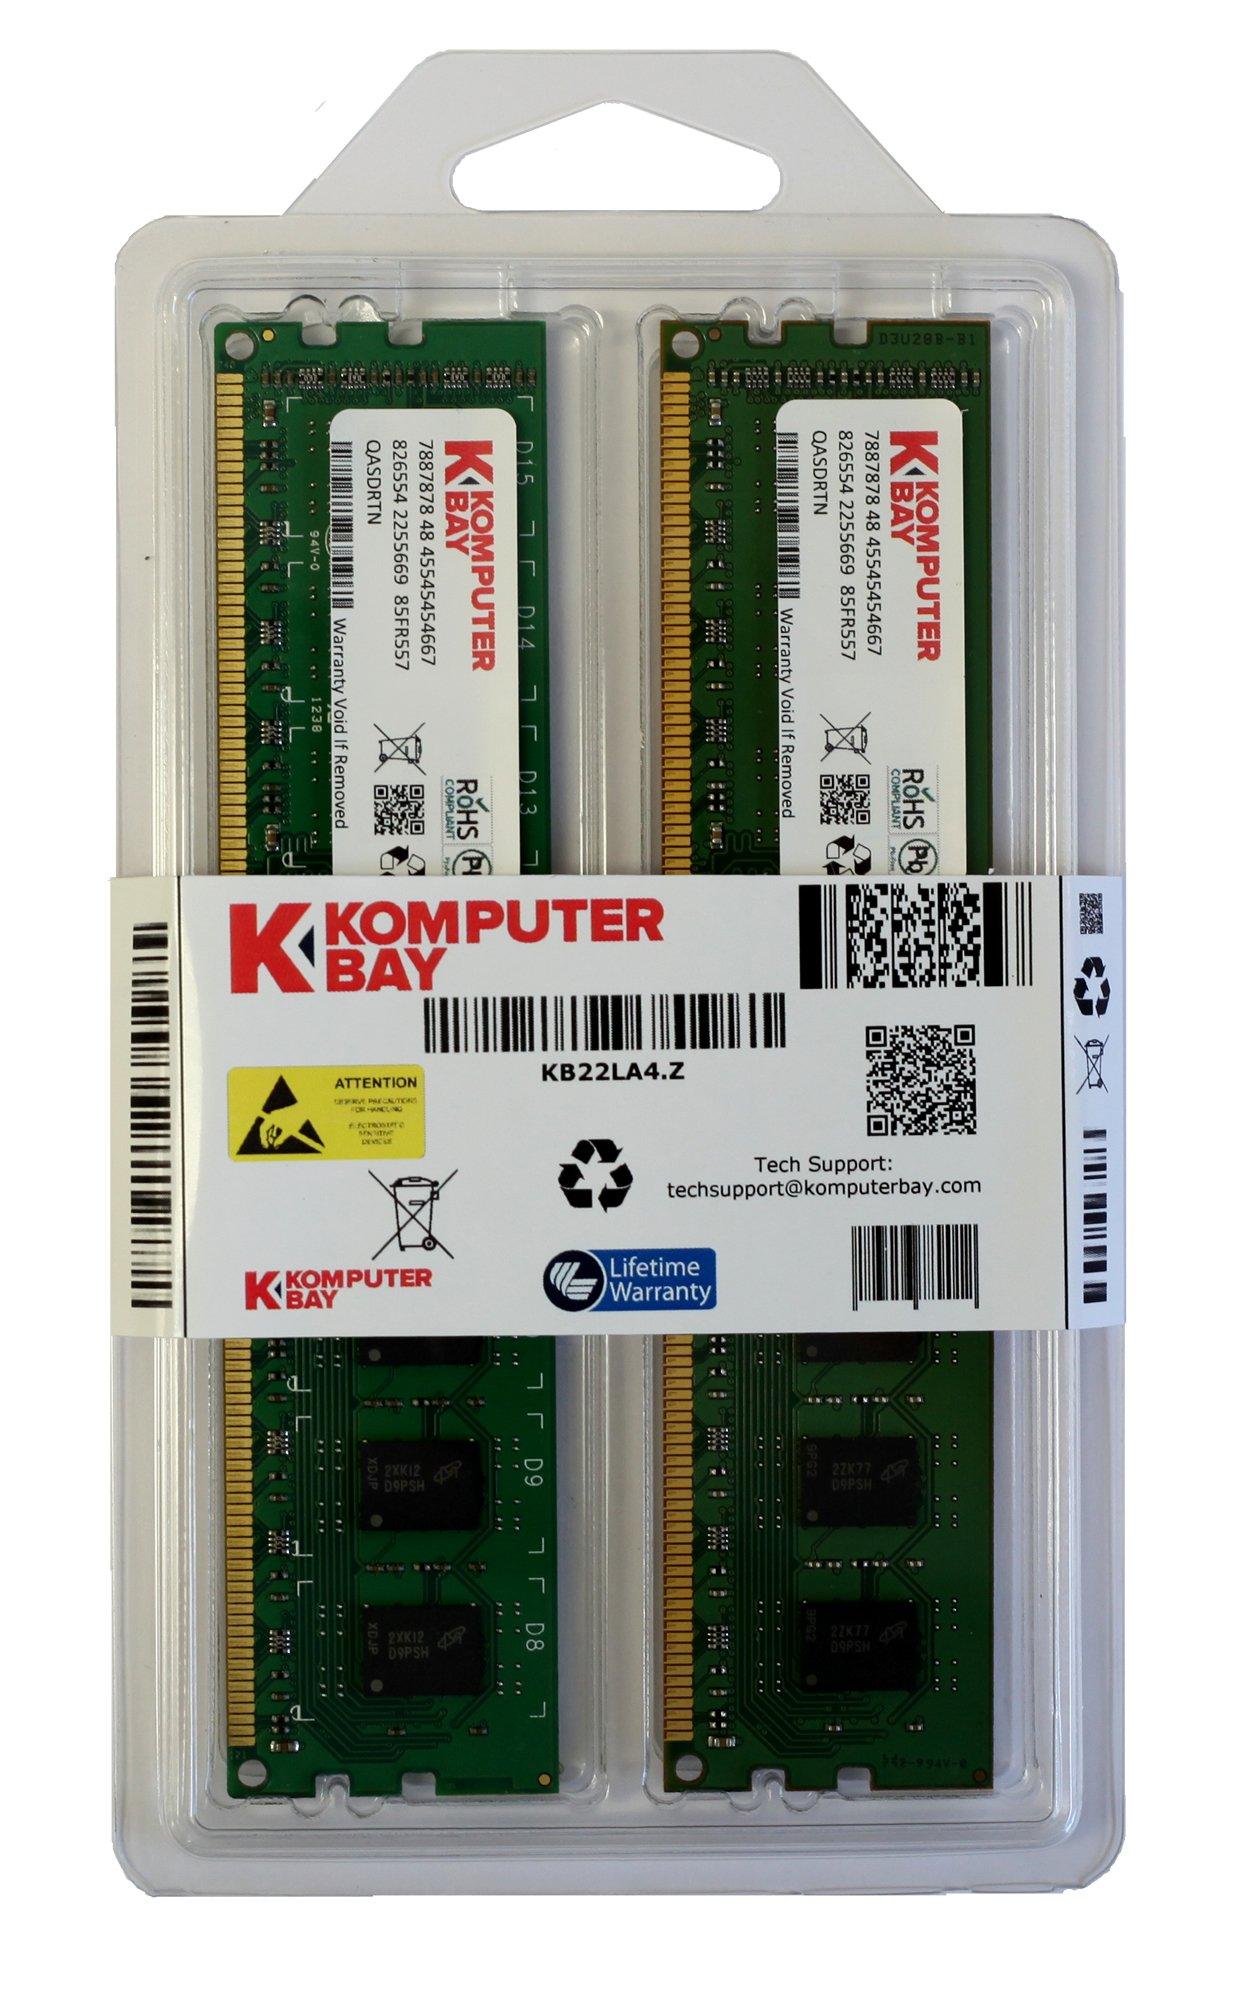 Komputerbay-4GB-2X-2GB-DDR2-800MHz-PC2-6300-PC2-6400-DDR2-800-240-PIN-DIMM-Desktop-Memory